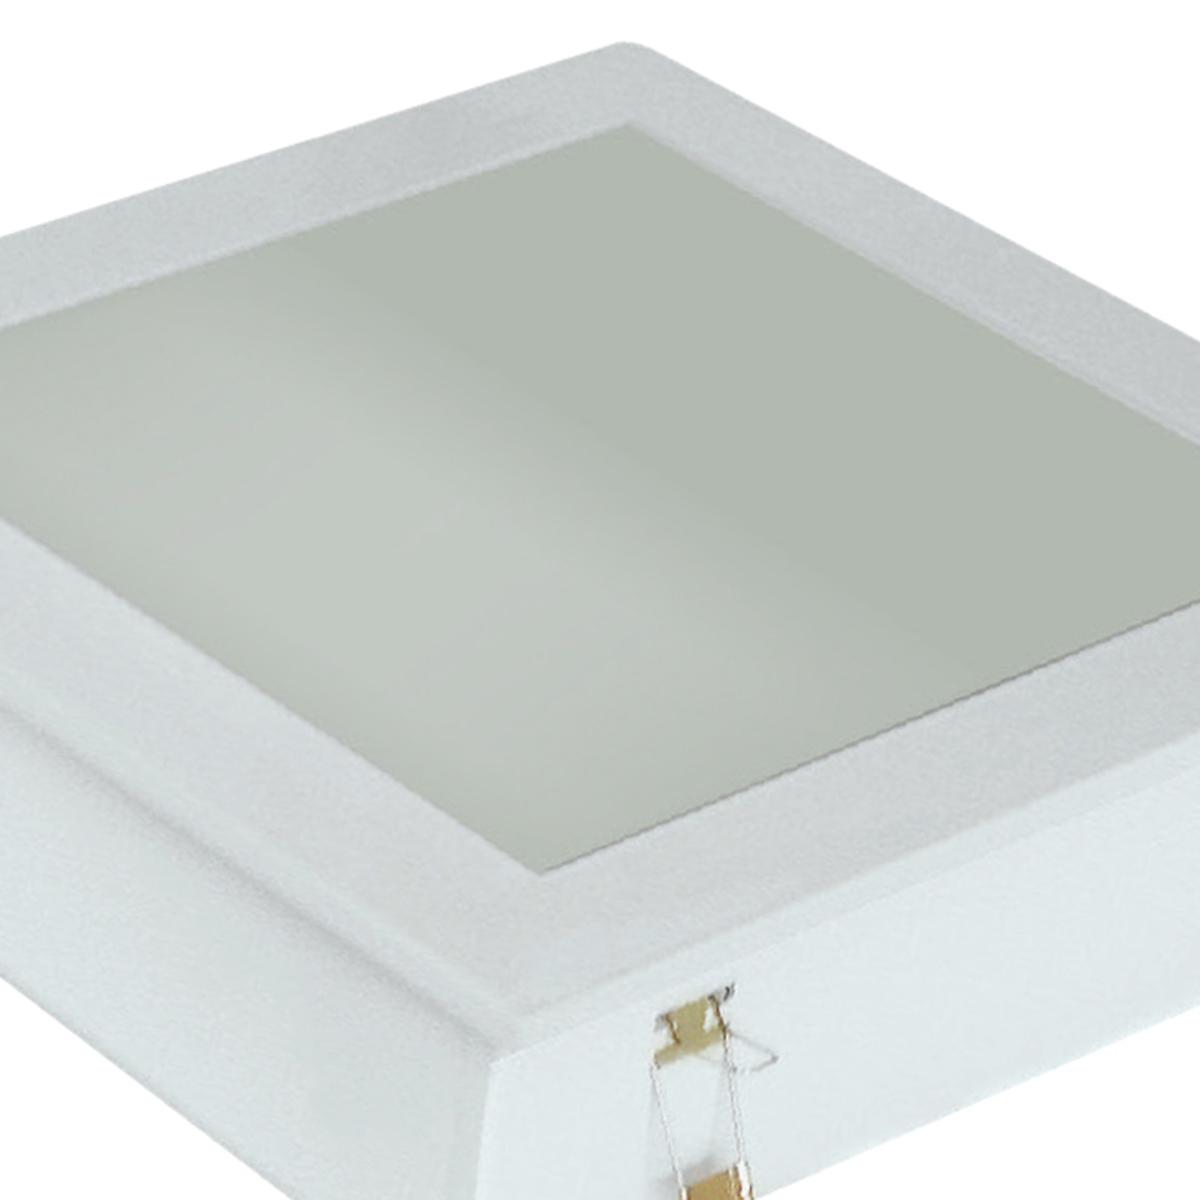 Plafon Space Emb. Quad. 30cm Alum. Vidro Fosco E-27 3 Lamp. Max 60w Branco